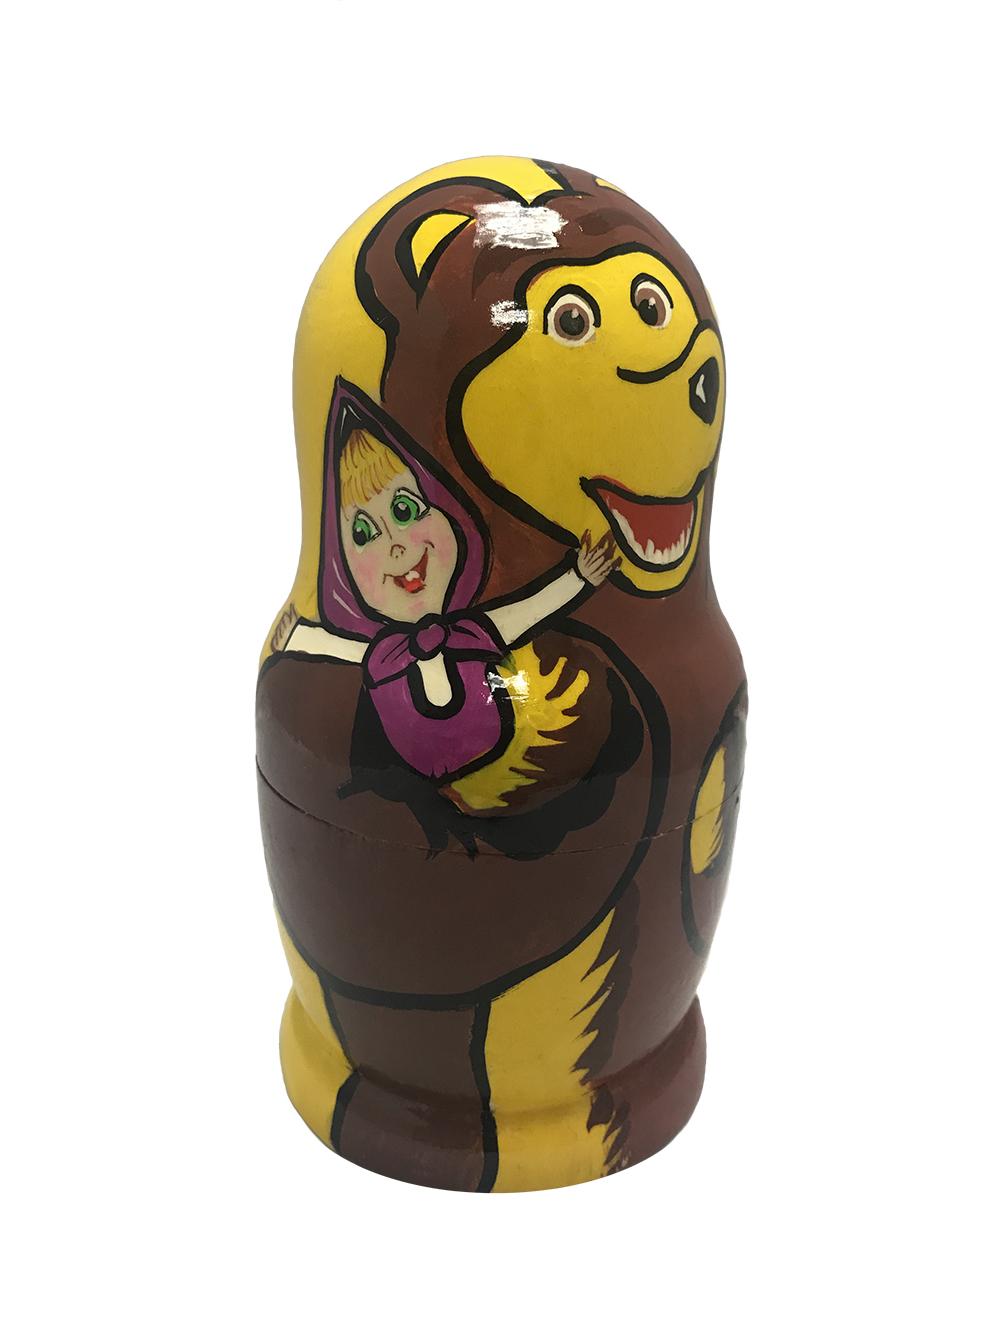 Masha and The Bear Nesting Dolls (Yellow), 5 pcs, 6